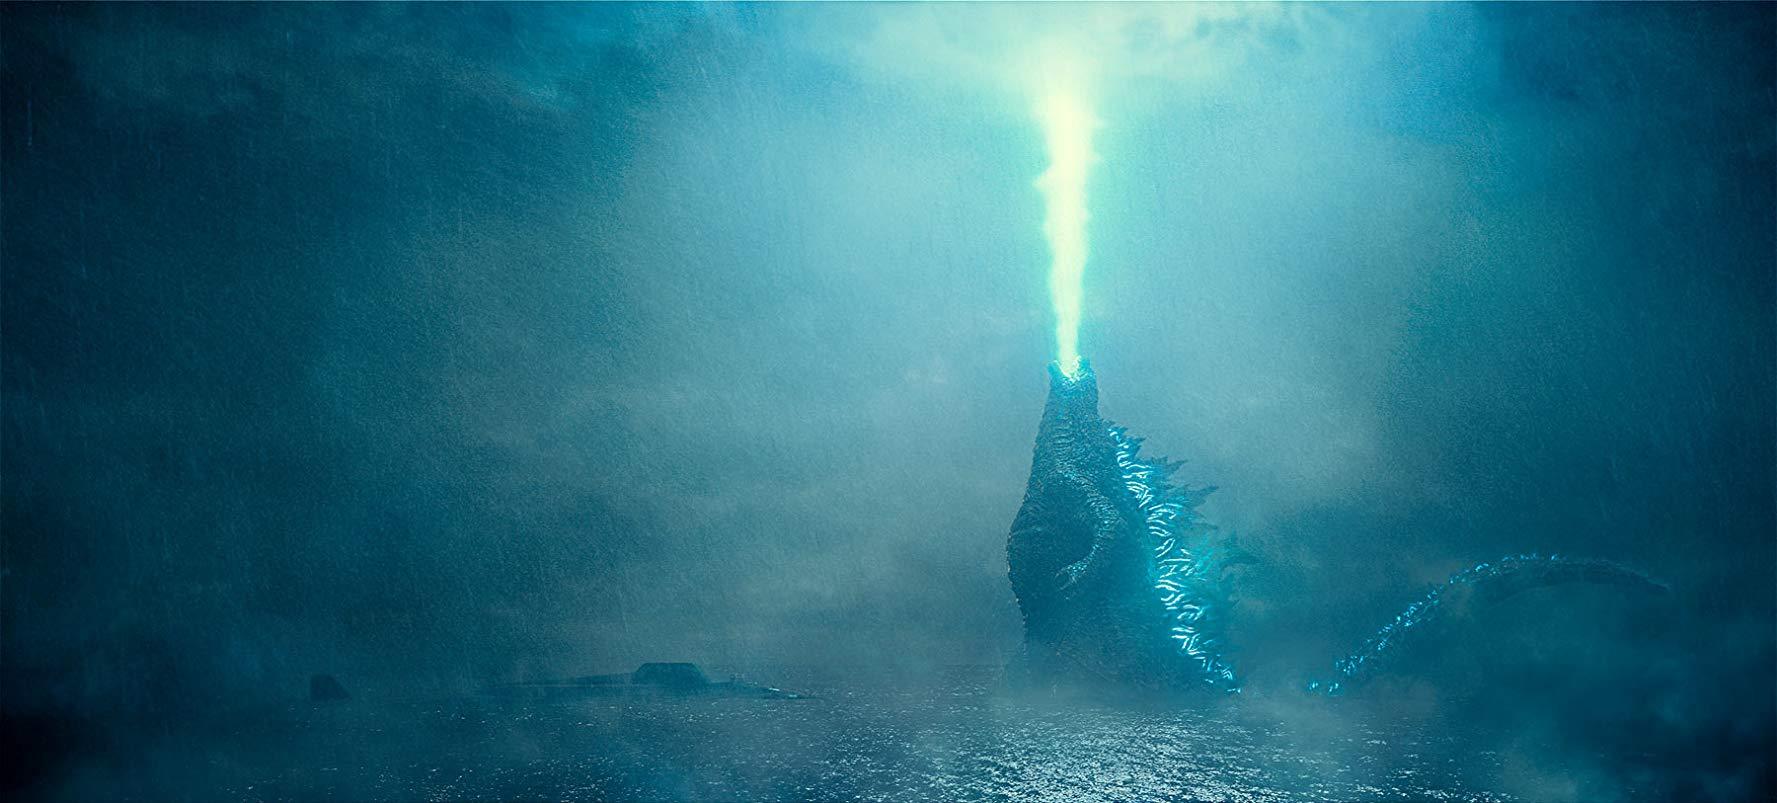 Godzilla: Vua Của Quái Vật - Ảnh 1